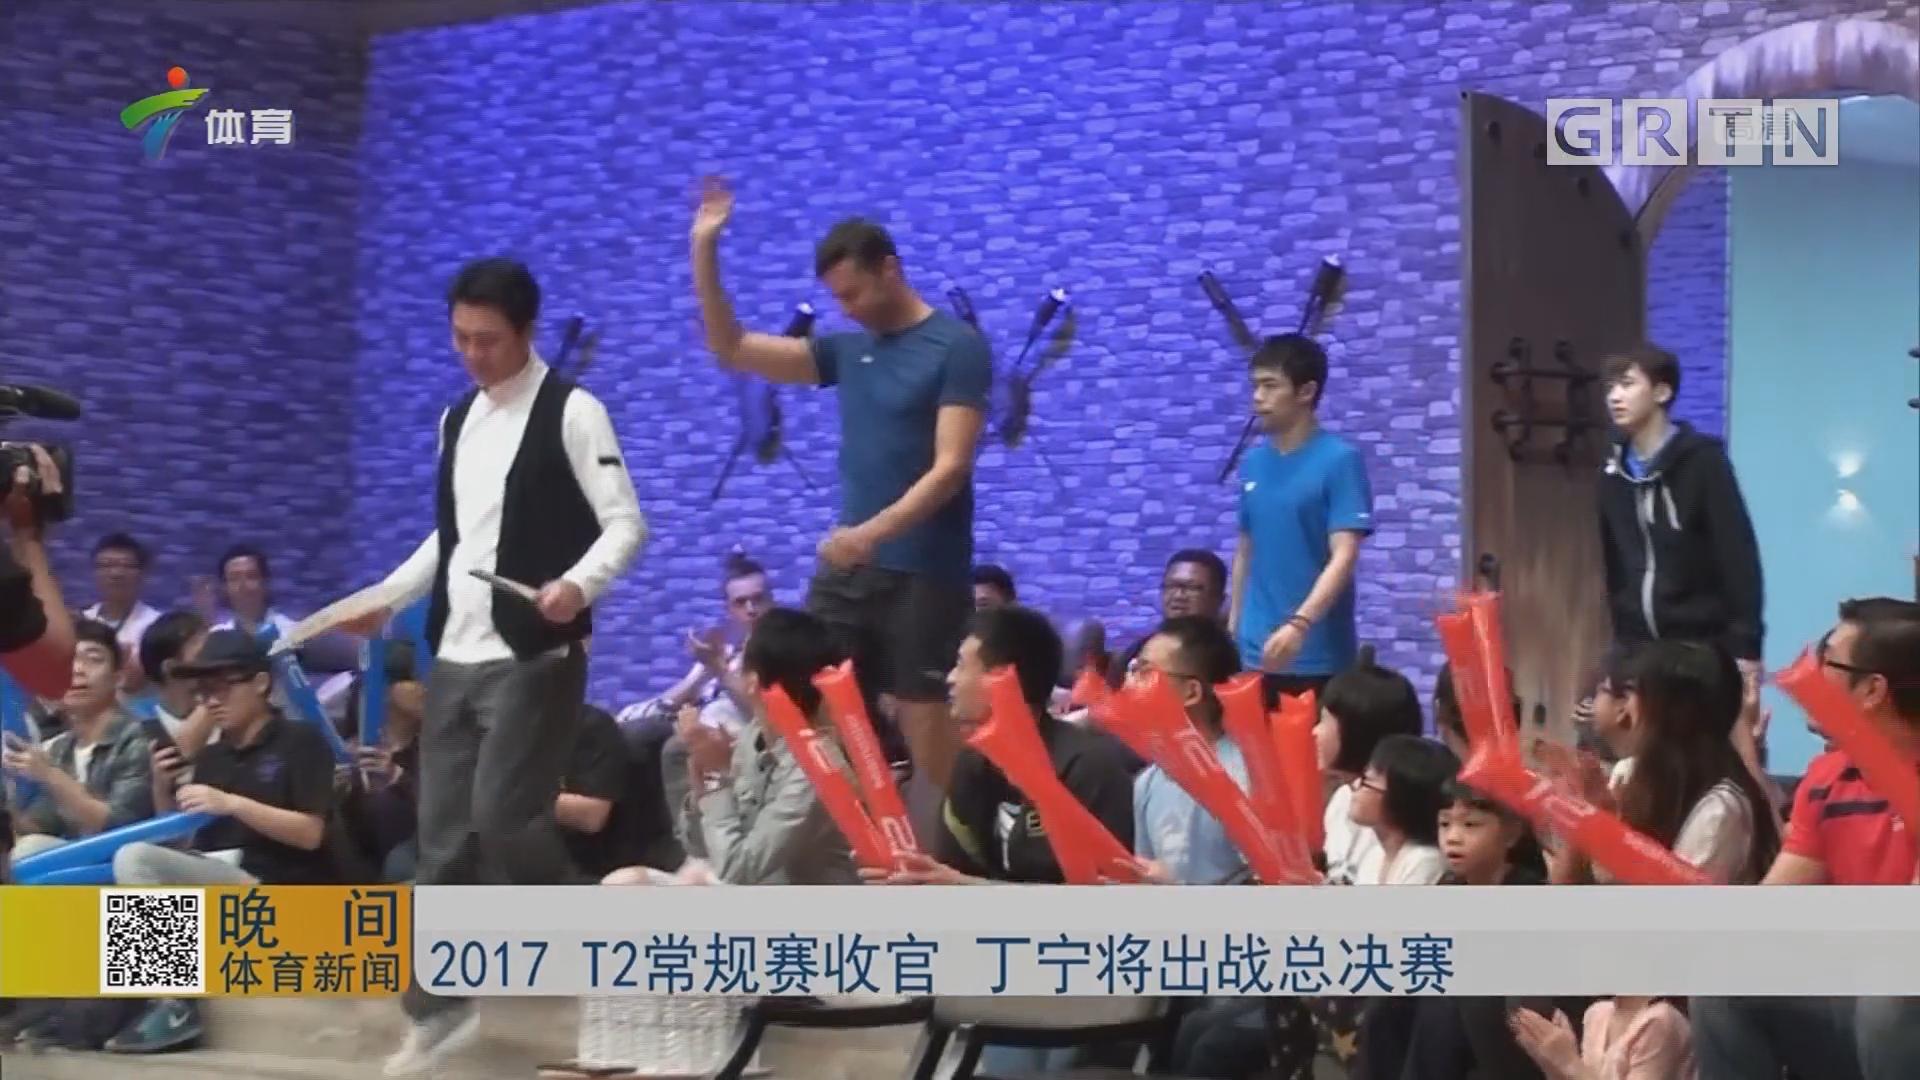 2017 T2常规赛收官 丁宁将出战总决赛